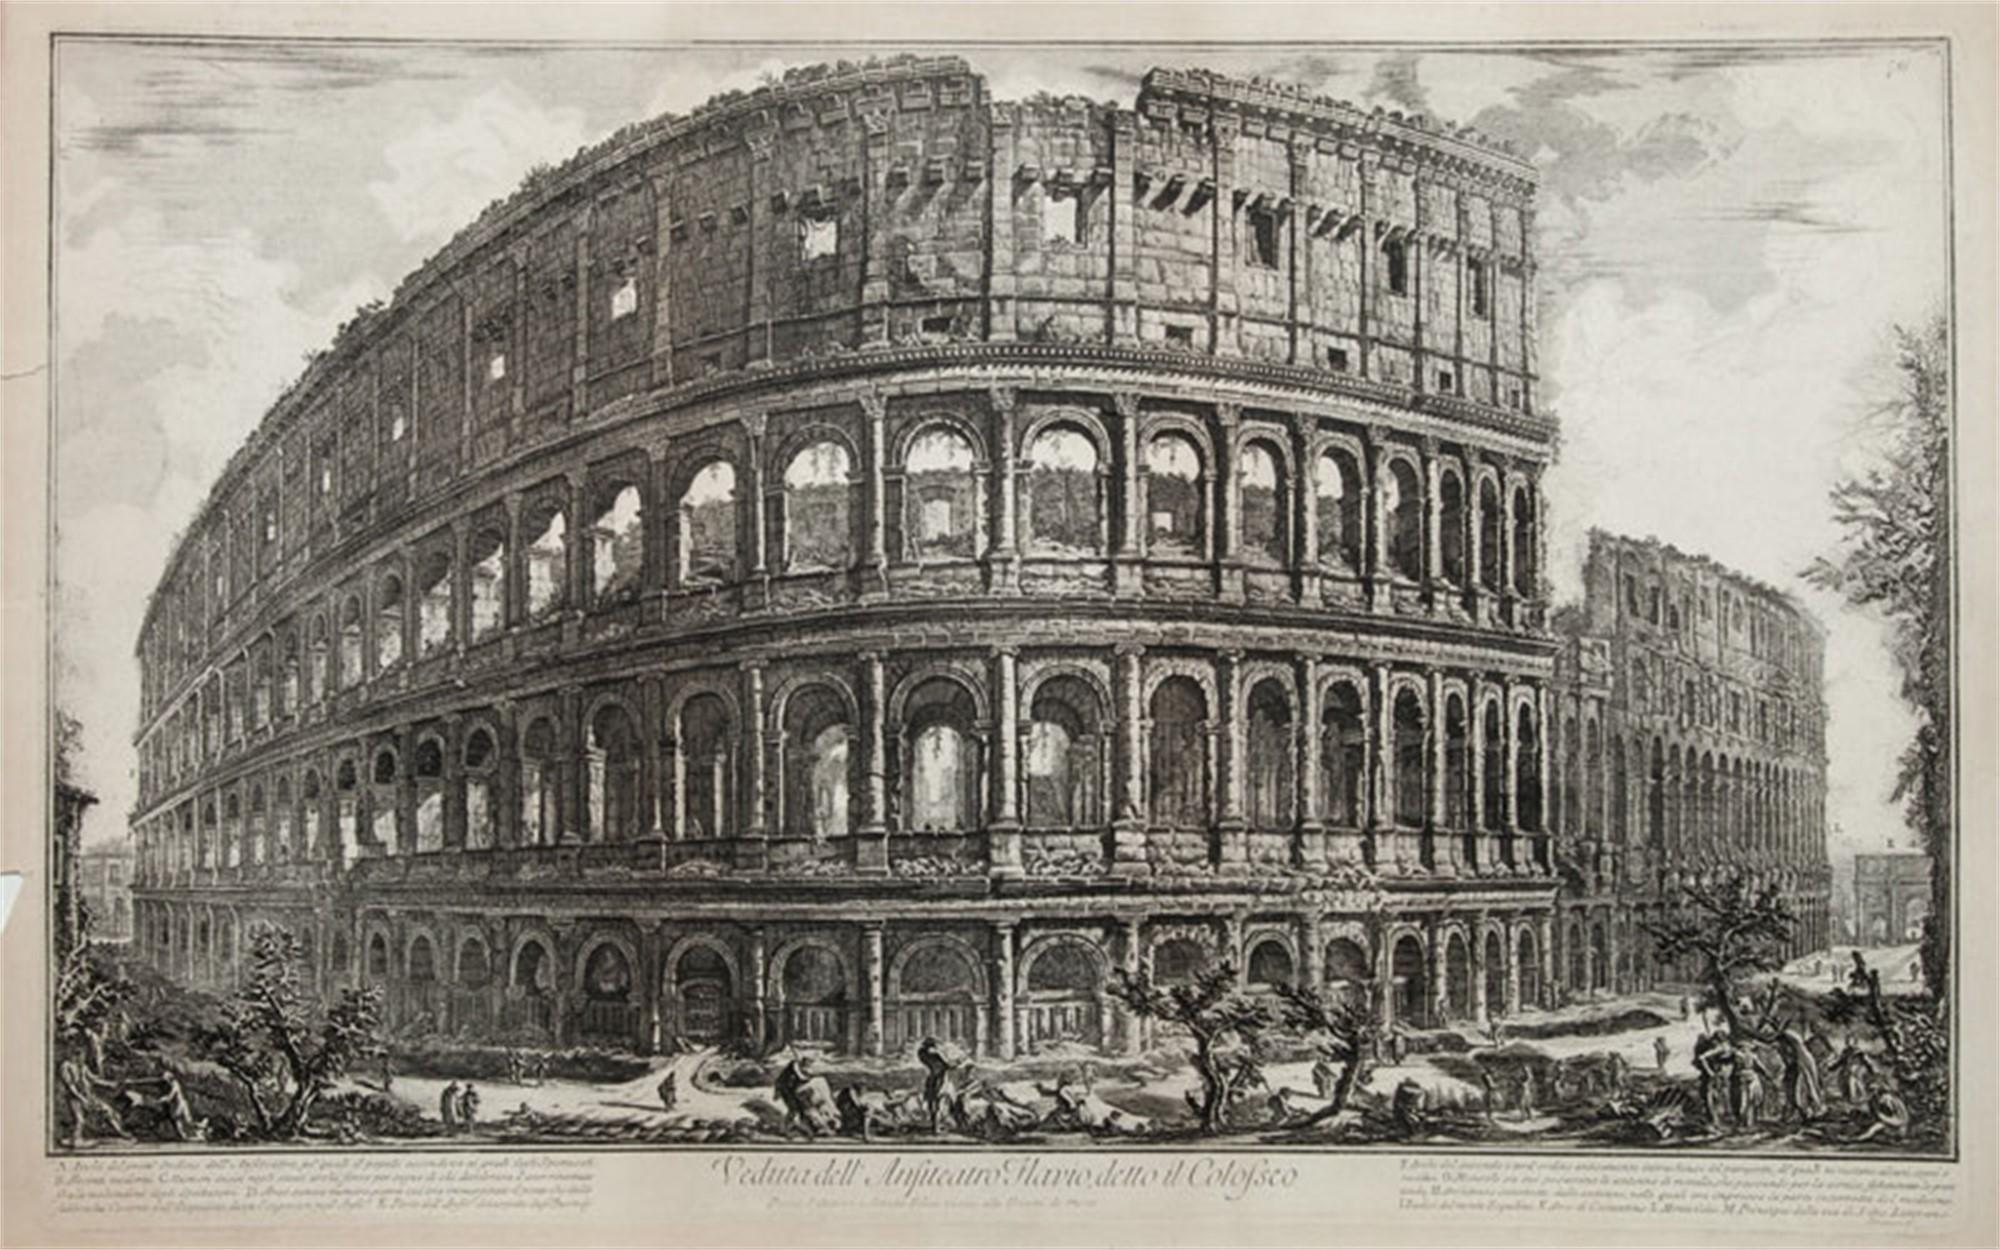 Colosseum by Francesco Piranesi